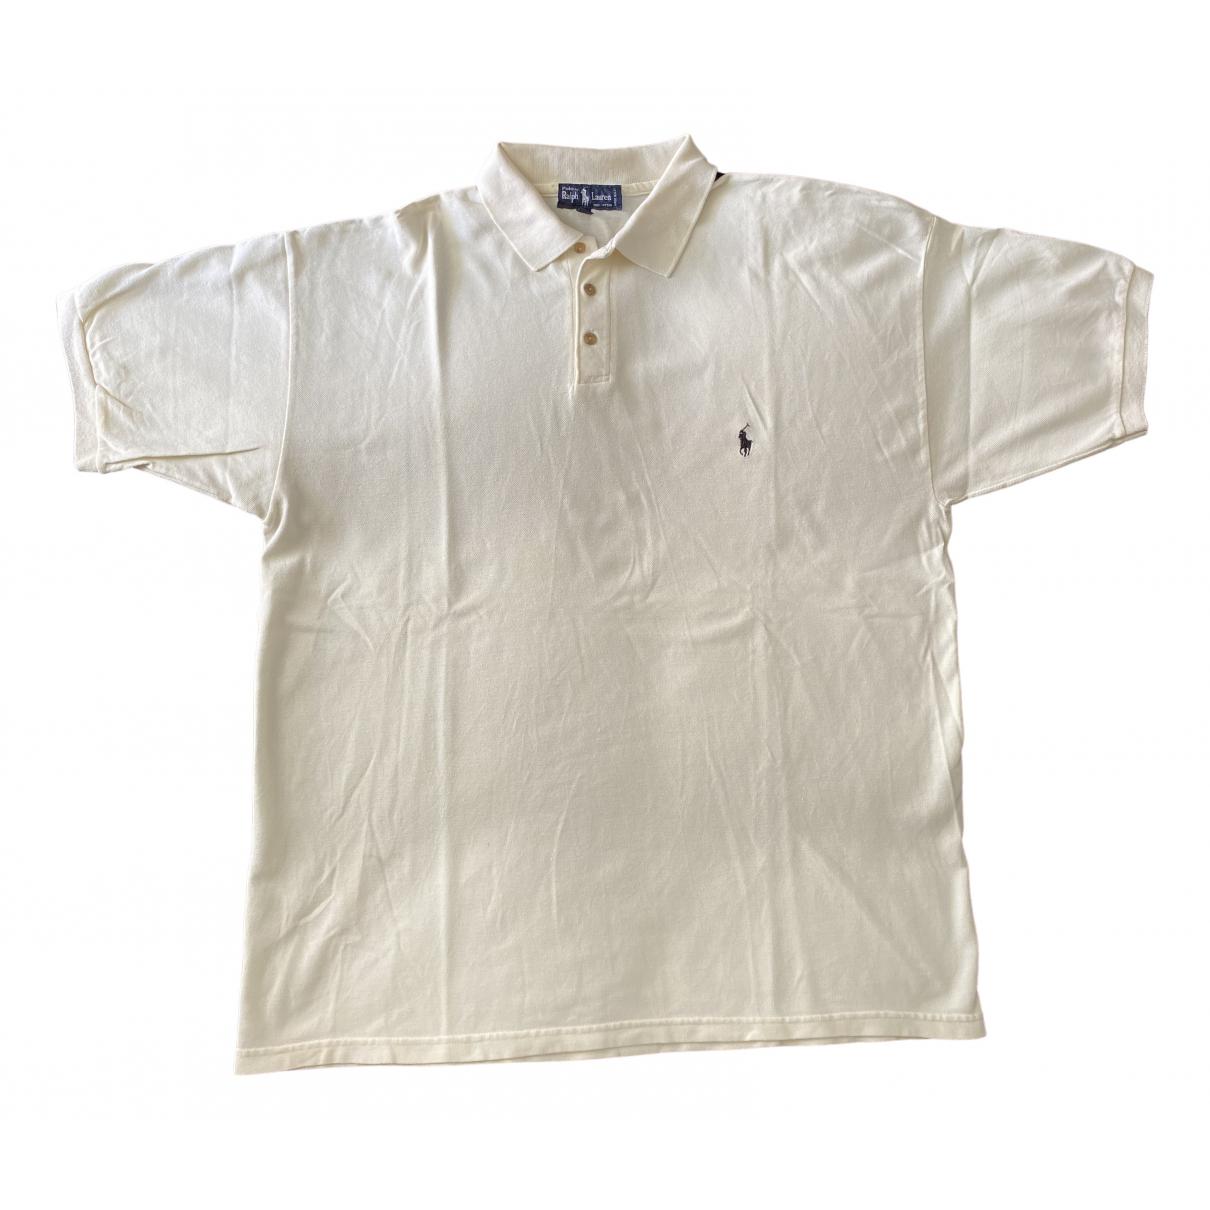 Polo Ralph Lauren - Polos Polo classique manches courtes pour homme en coton - ecru